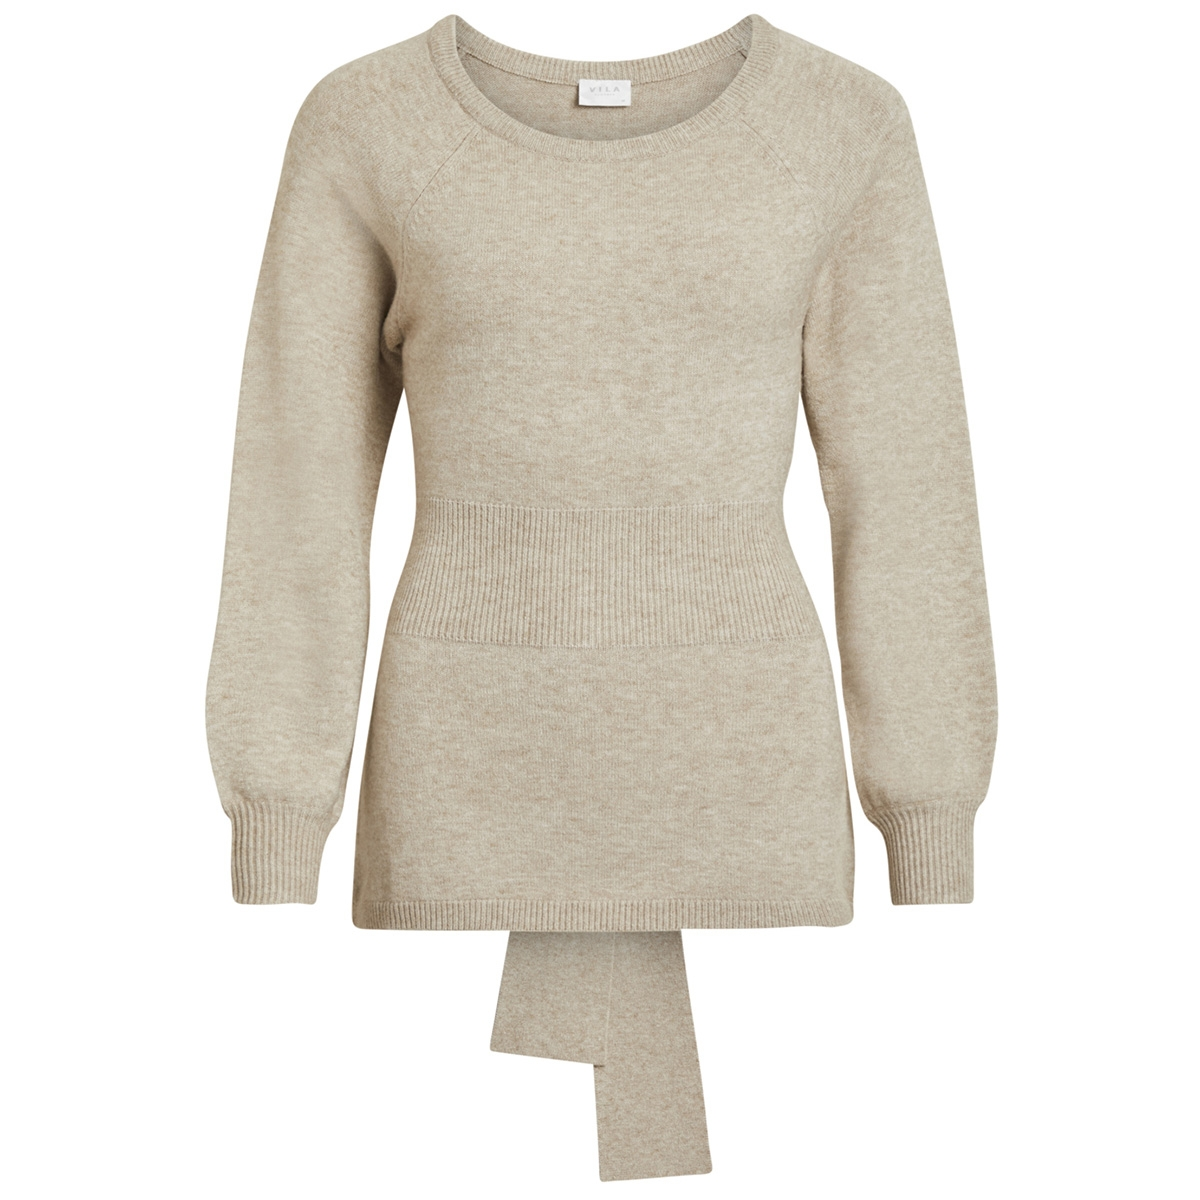 viril knit tie l/s top 14050299 vila trui natural melange